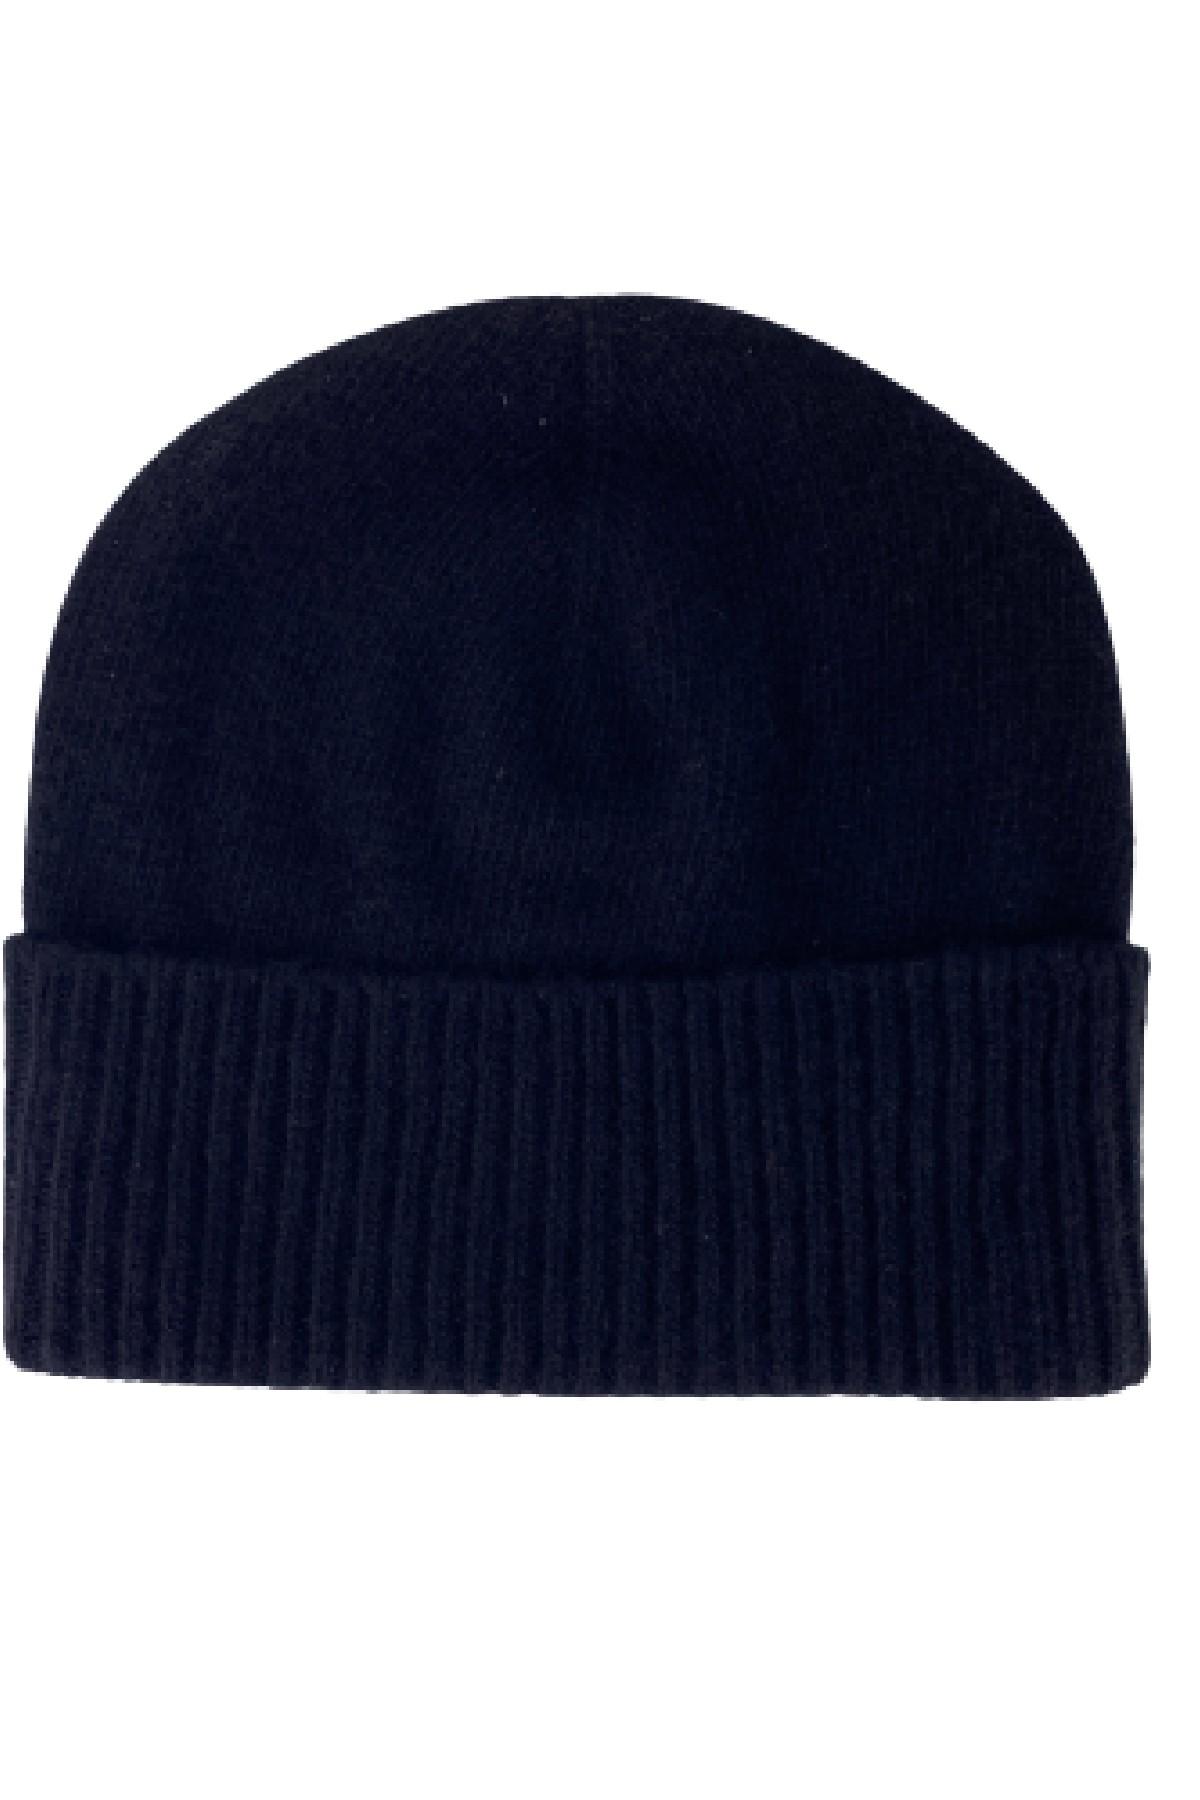 cappello in cachemire con etichetta logo DONDUP   26   UQ100Y00480U999